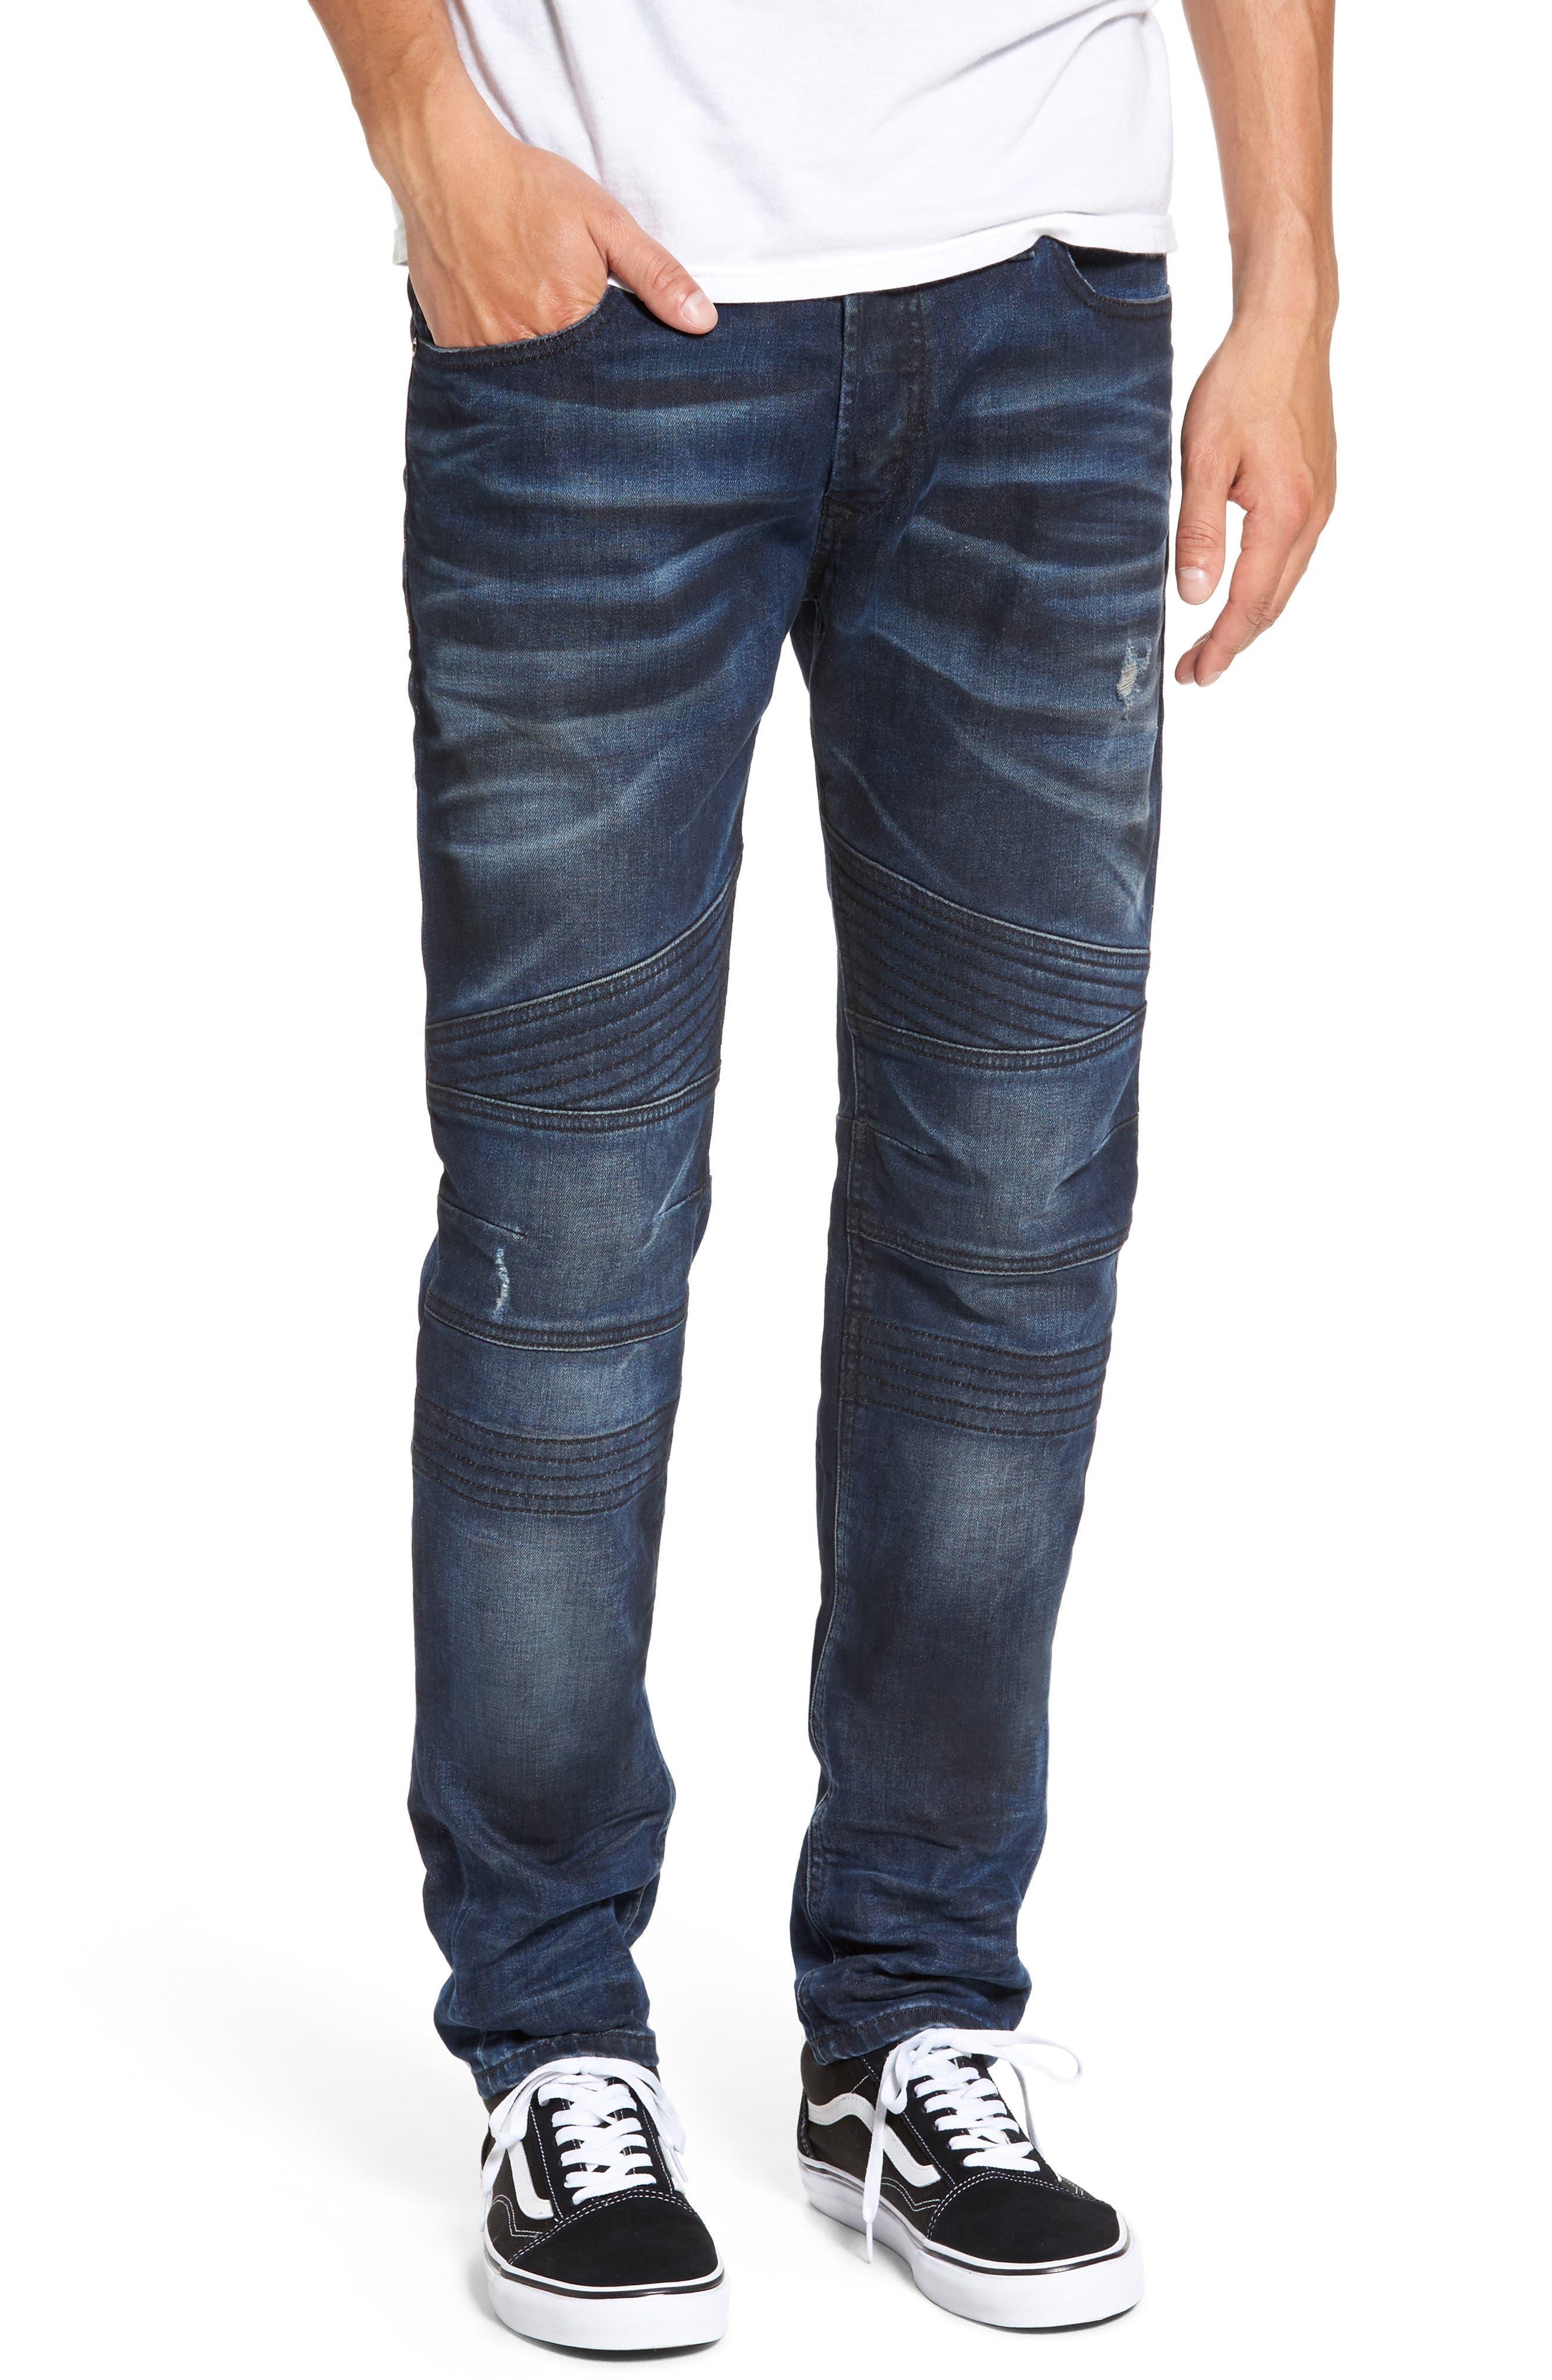 Fourk Skinny Fit Jeans,                         Main,                         color, Denim